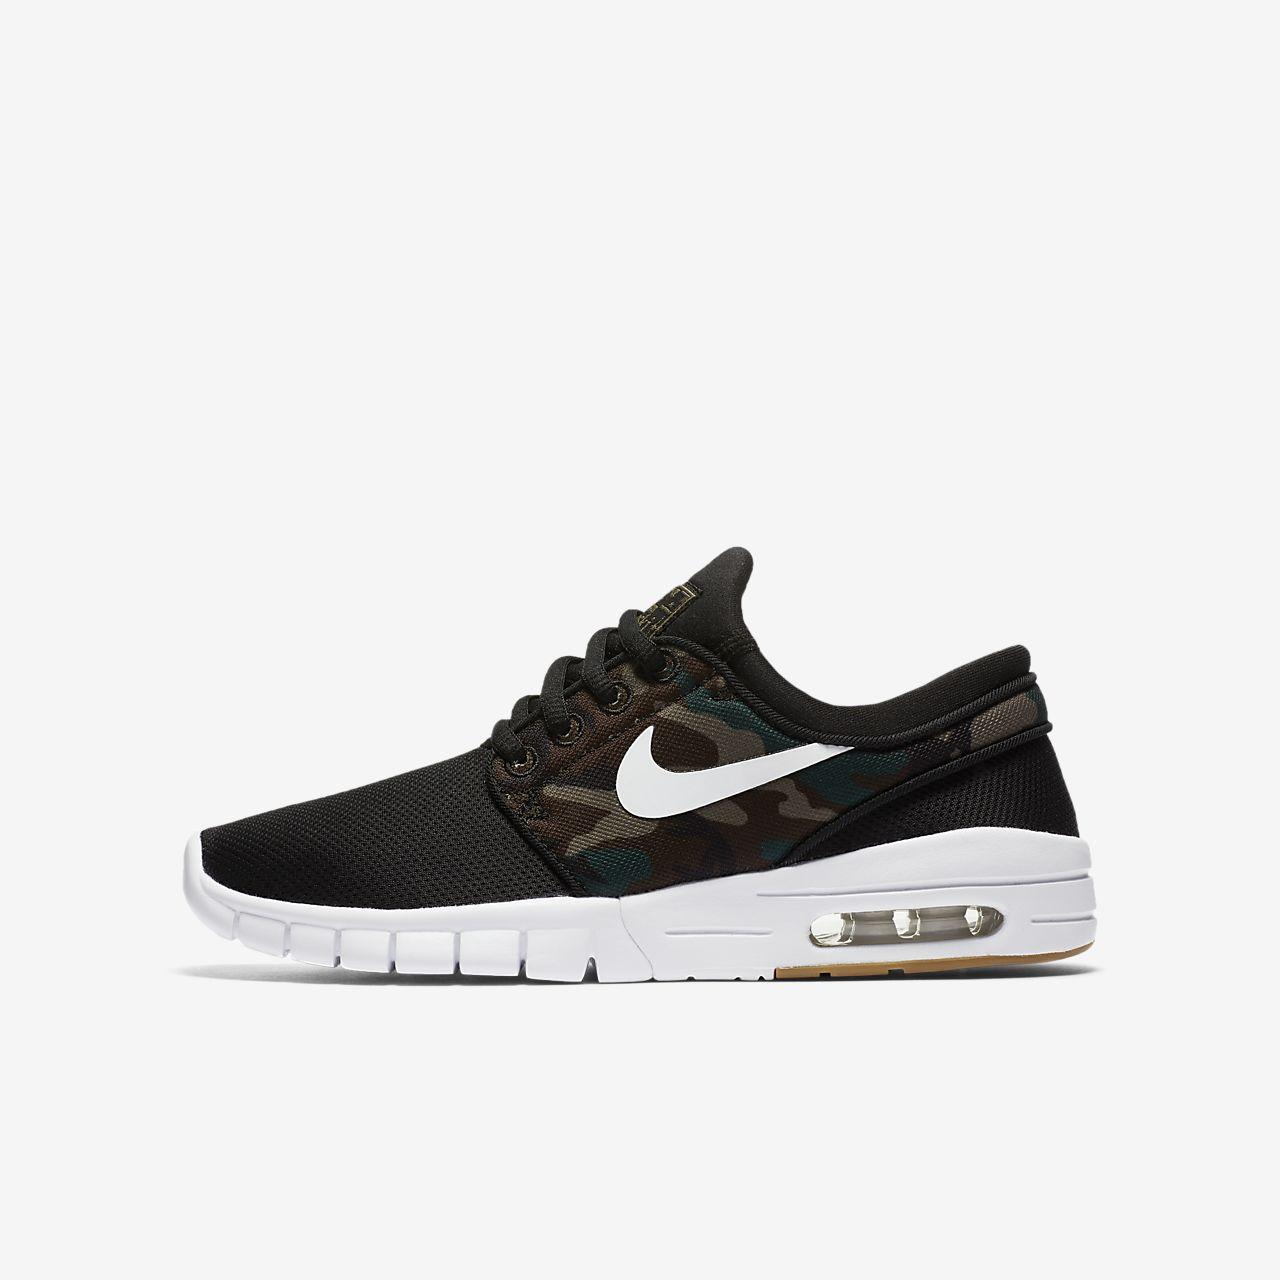 Nike SB STEFAN JANOSKI MAX - Trainers - black/white/medium olive/light brown DlWzMR